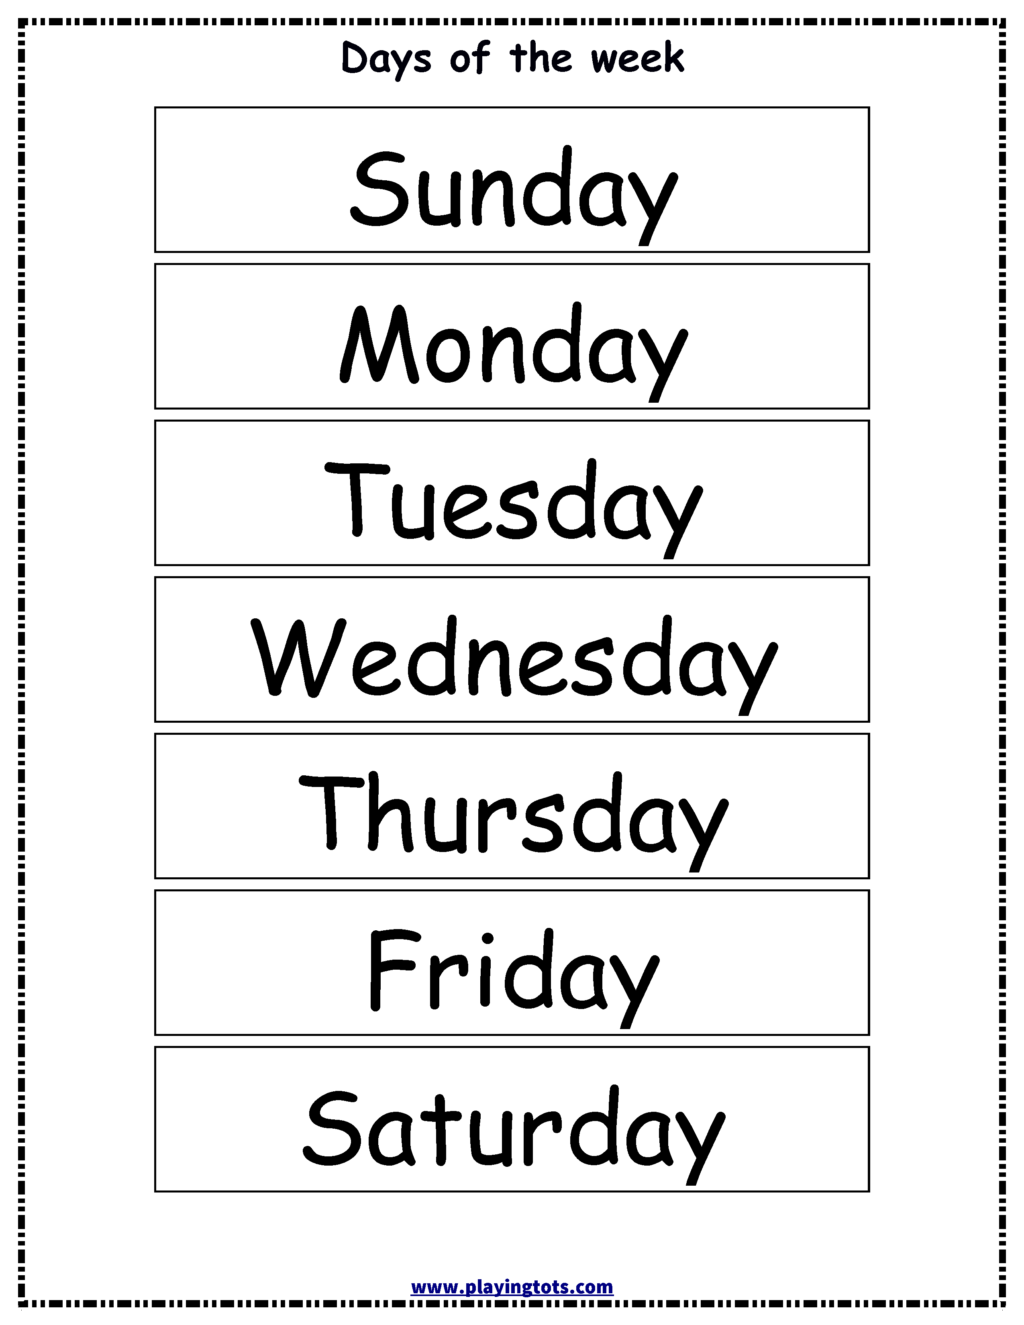 Worksheet ~ Preschool English Worksheets Free Printable Days